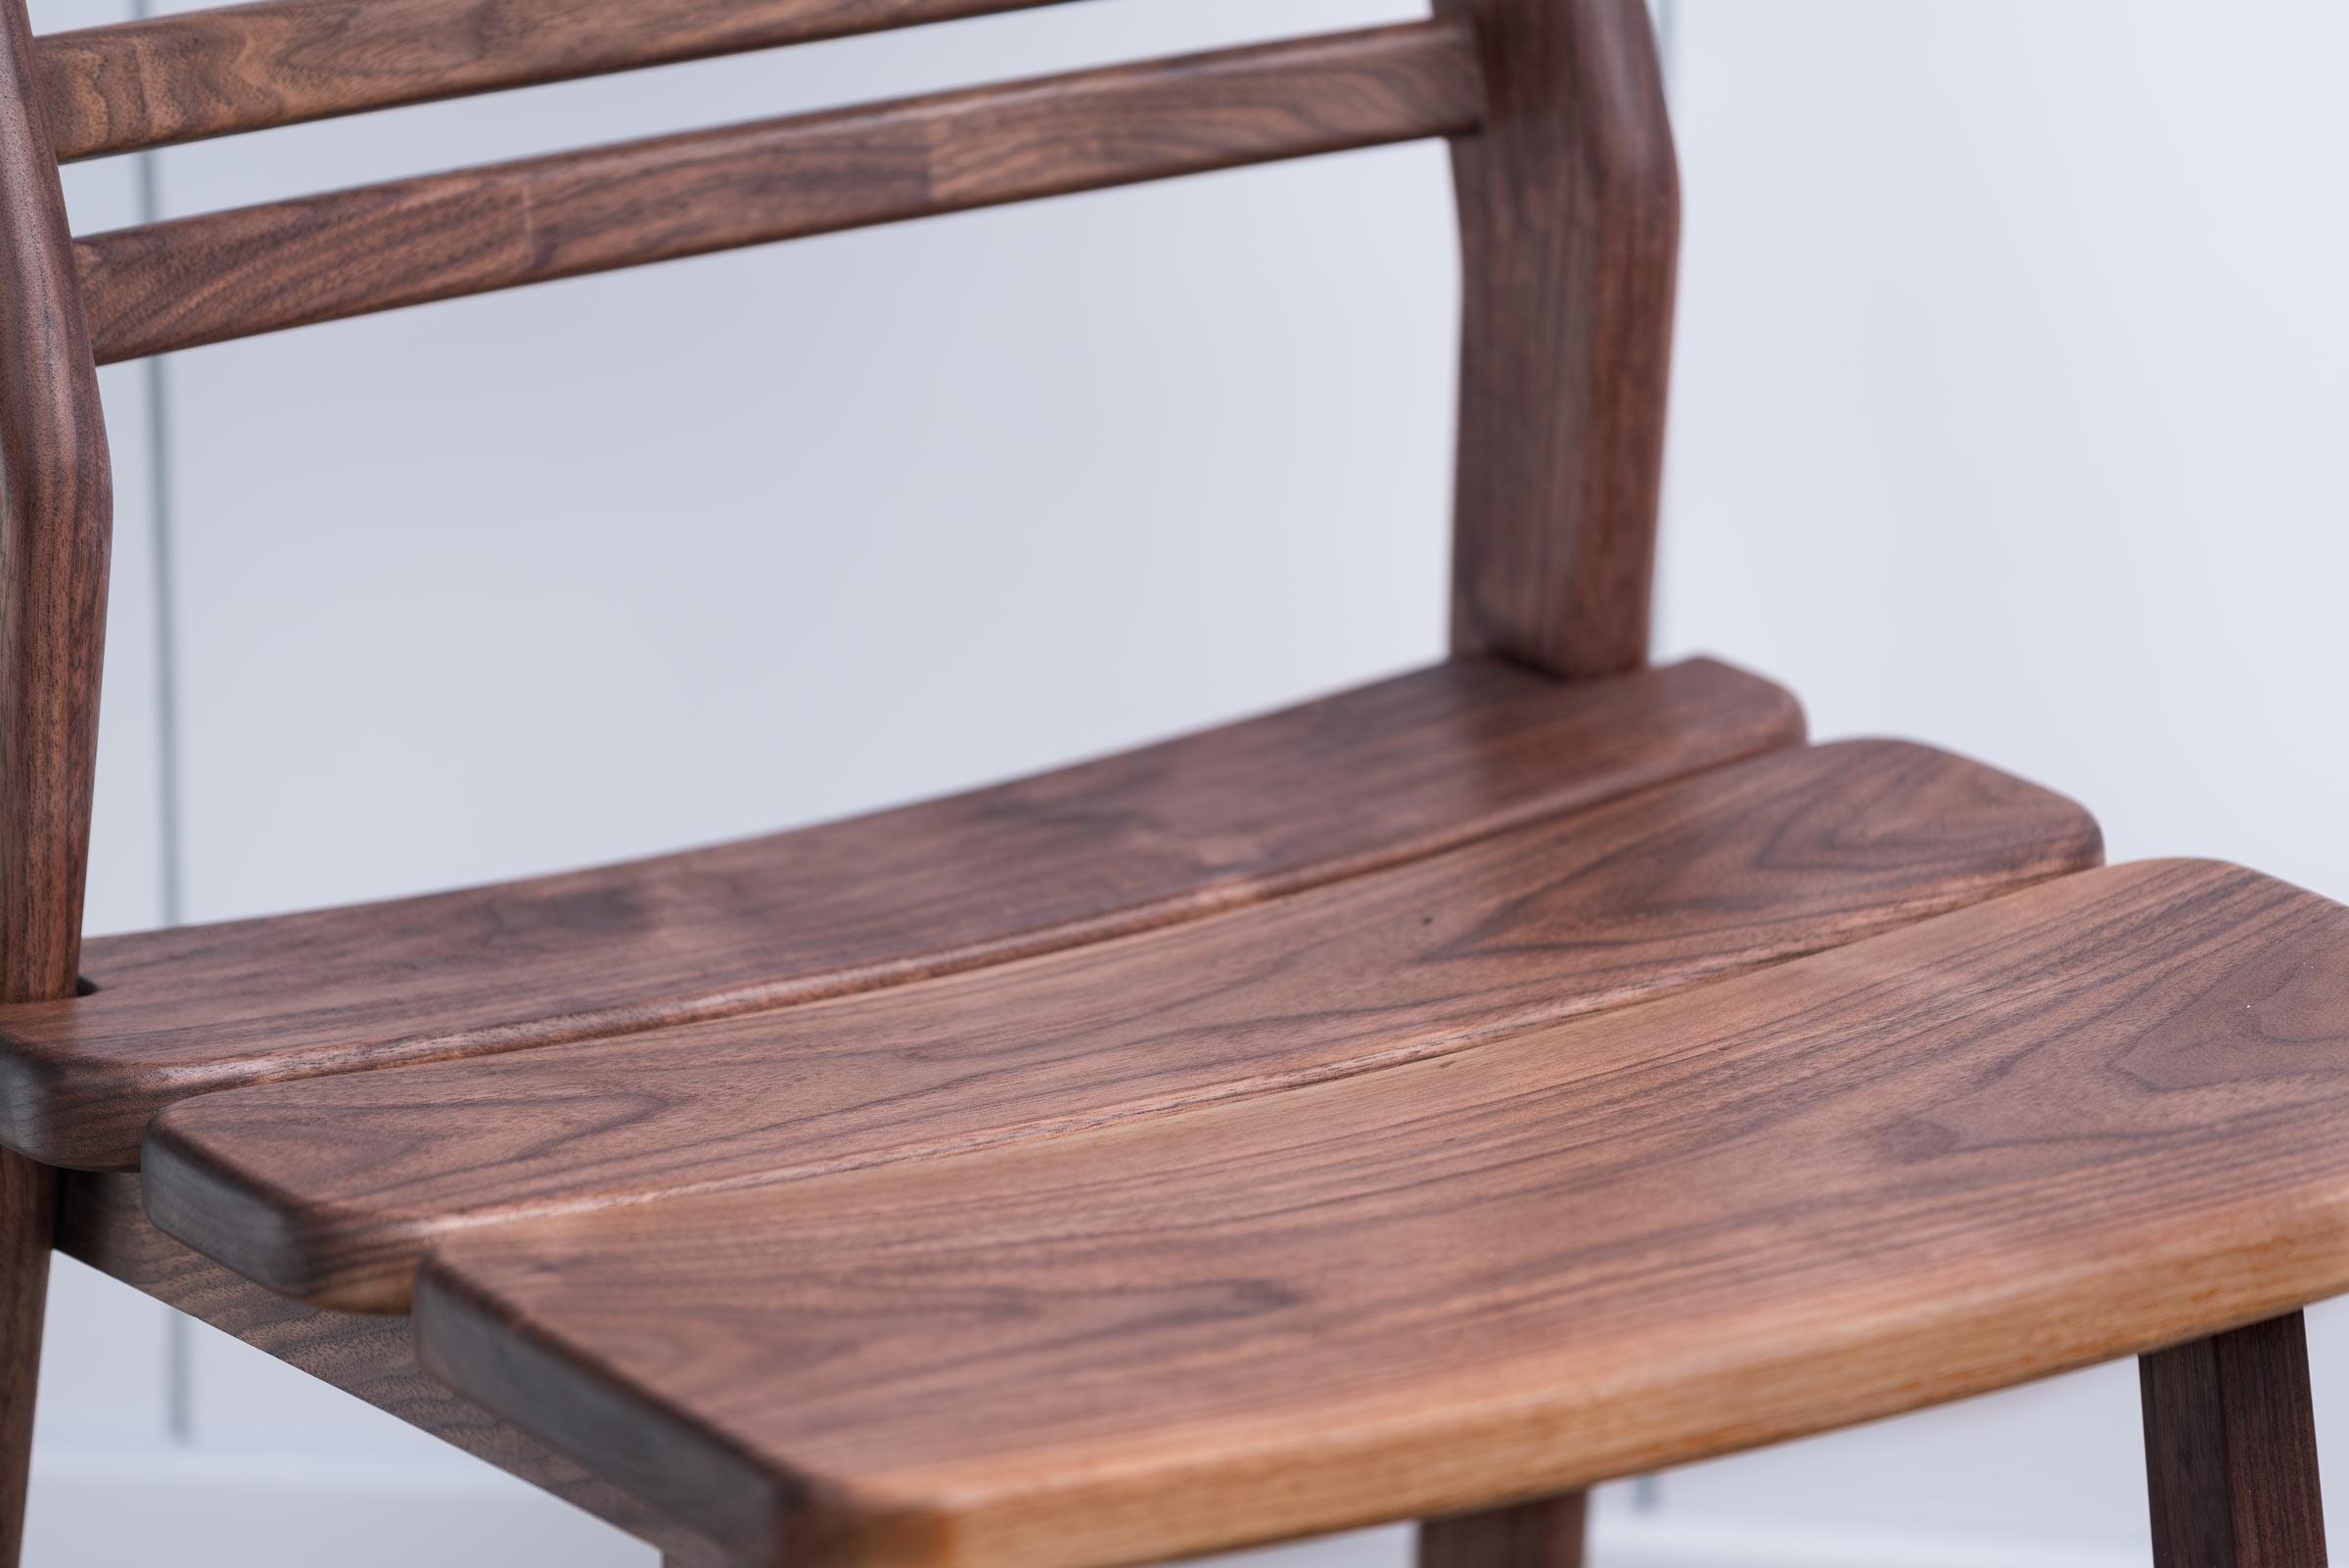 seat-detail-comp.jpg